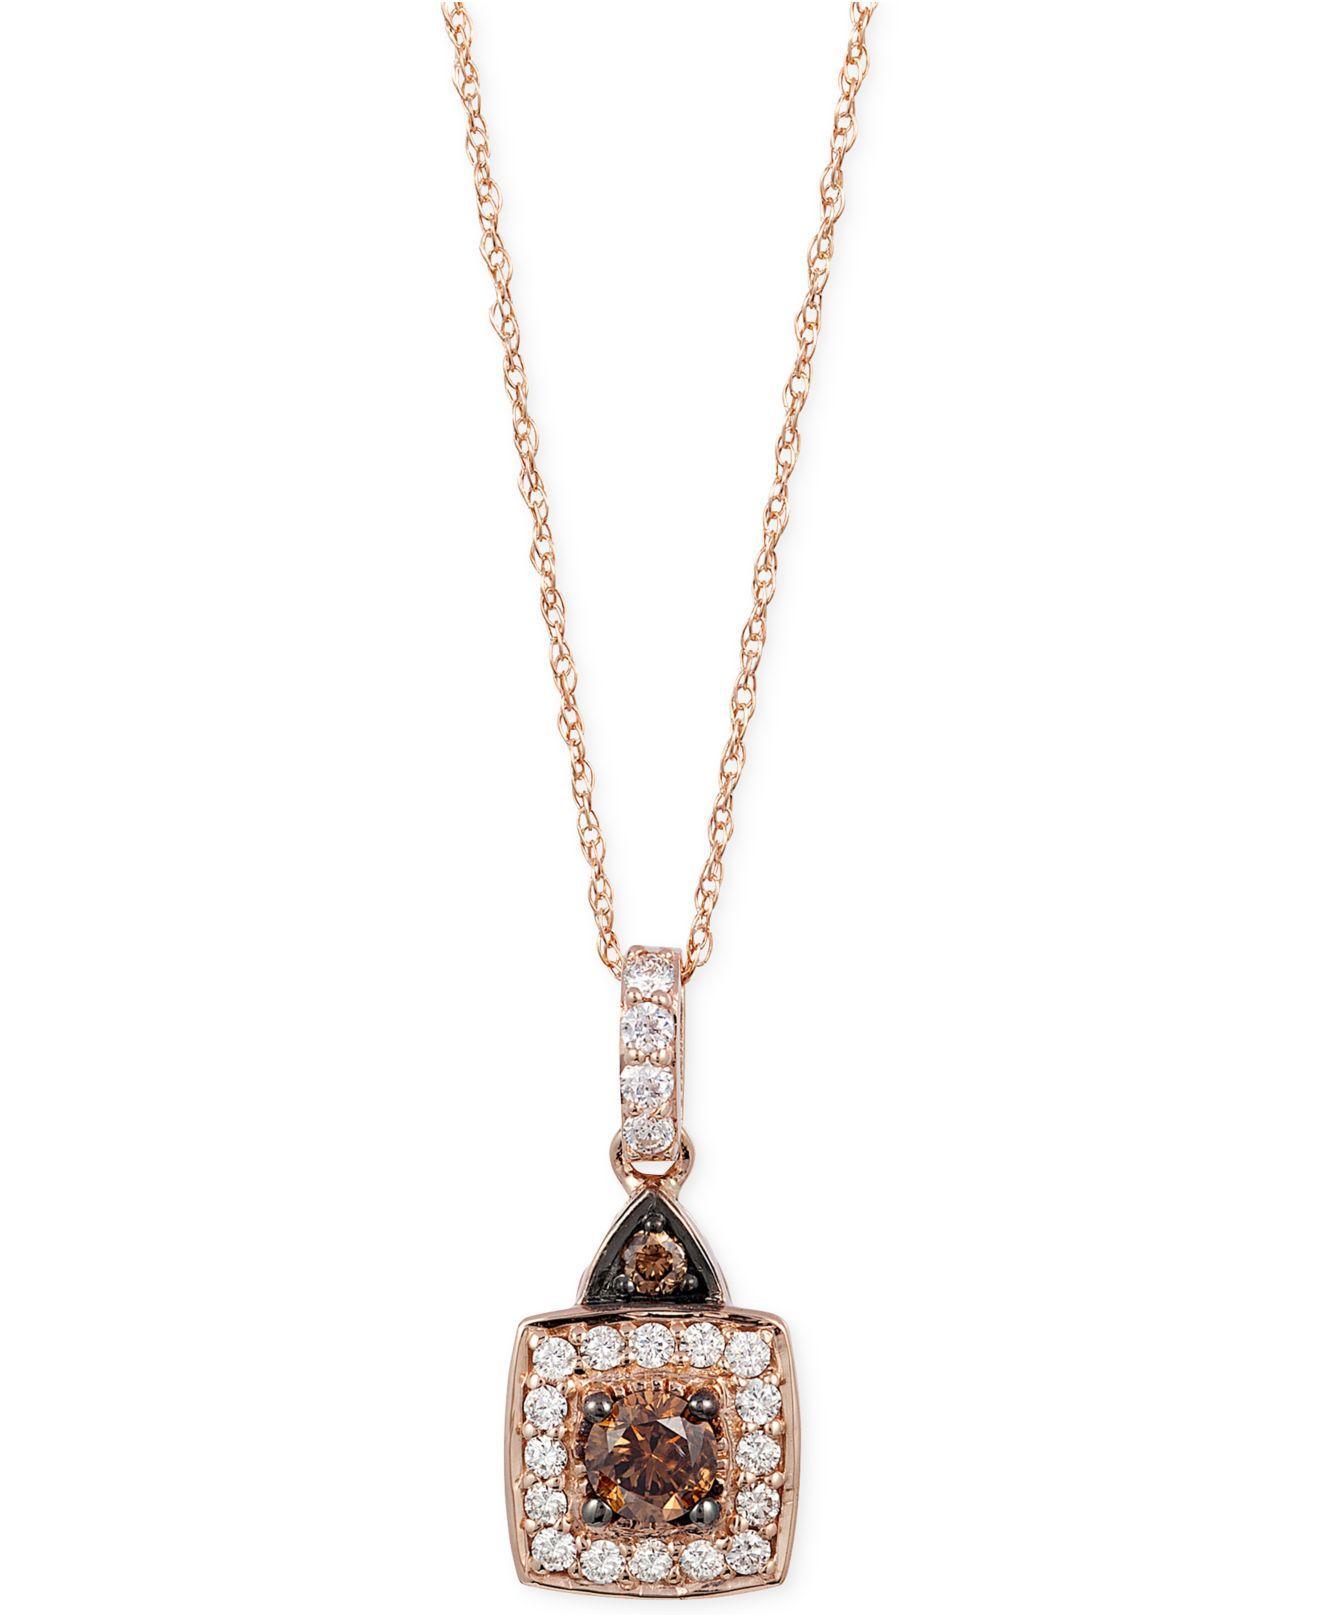 le vian chocolate and white diamond pendant necklace 1 2. Black Bedroom Furniture Sets. Home Design Ideas